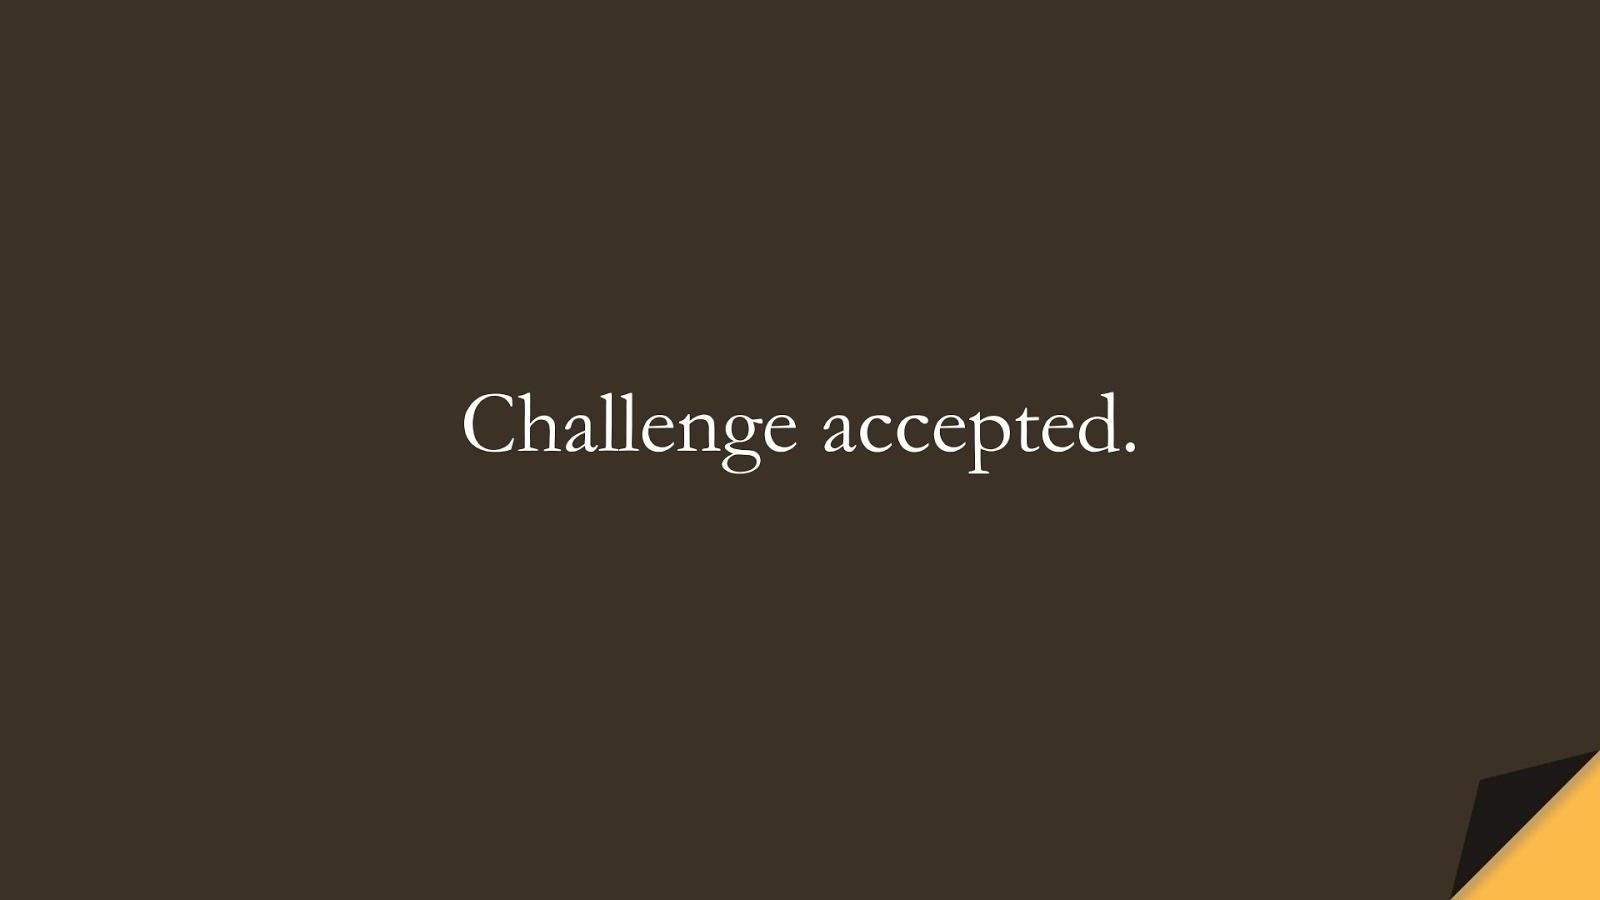 Challenge accepted.FALSE